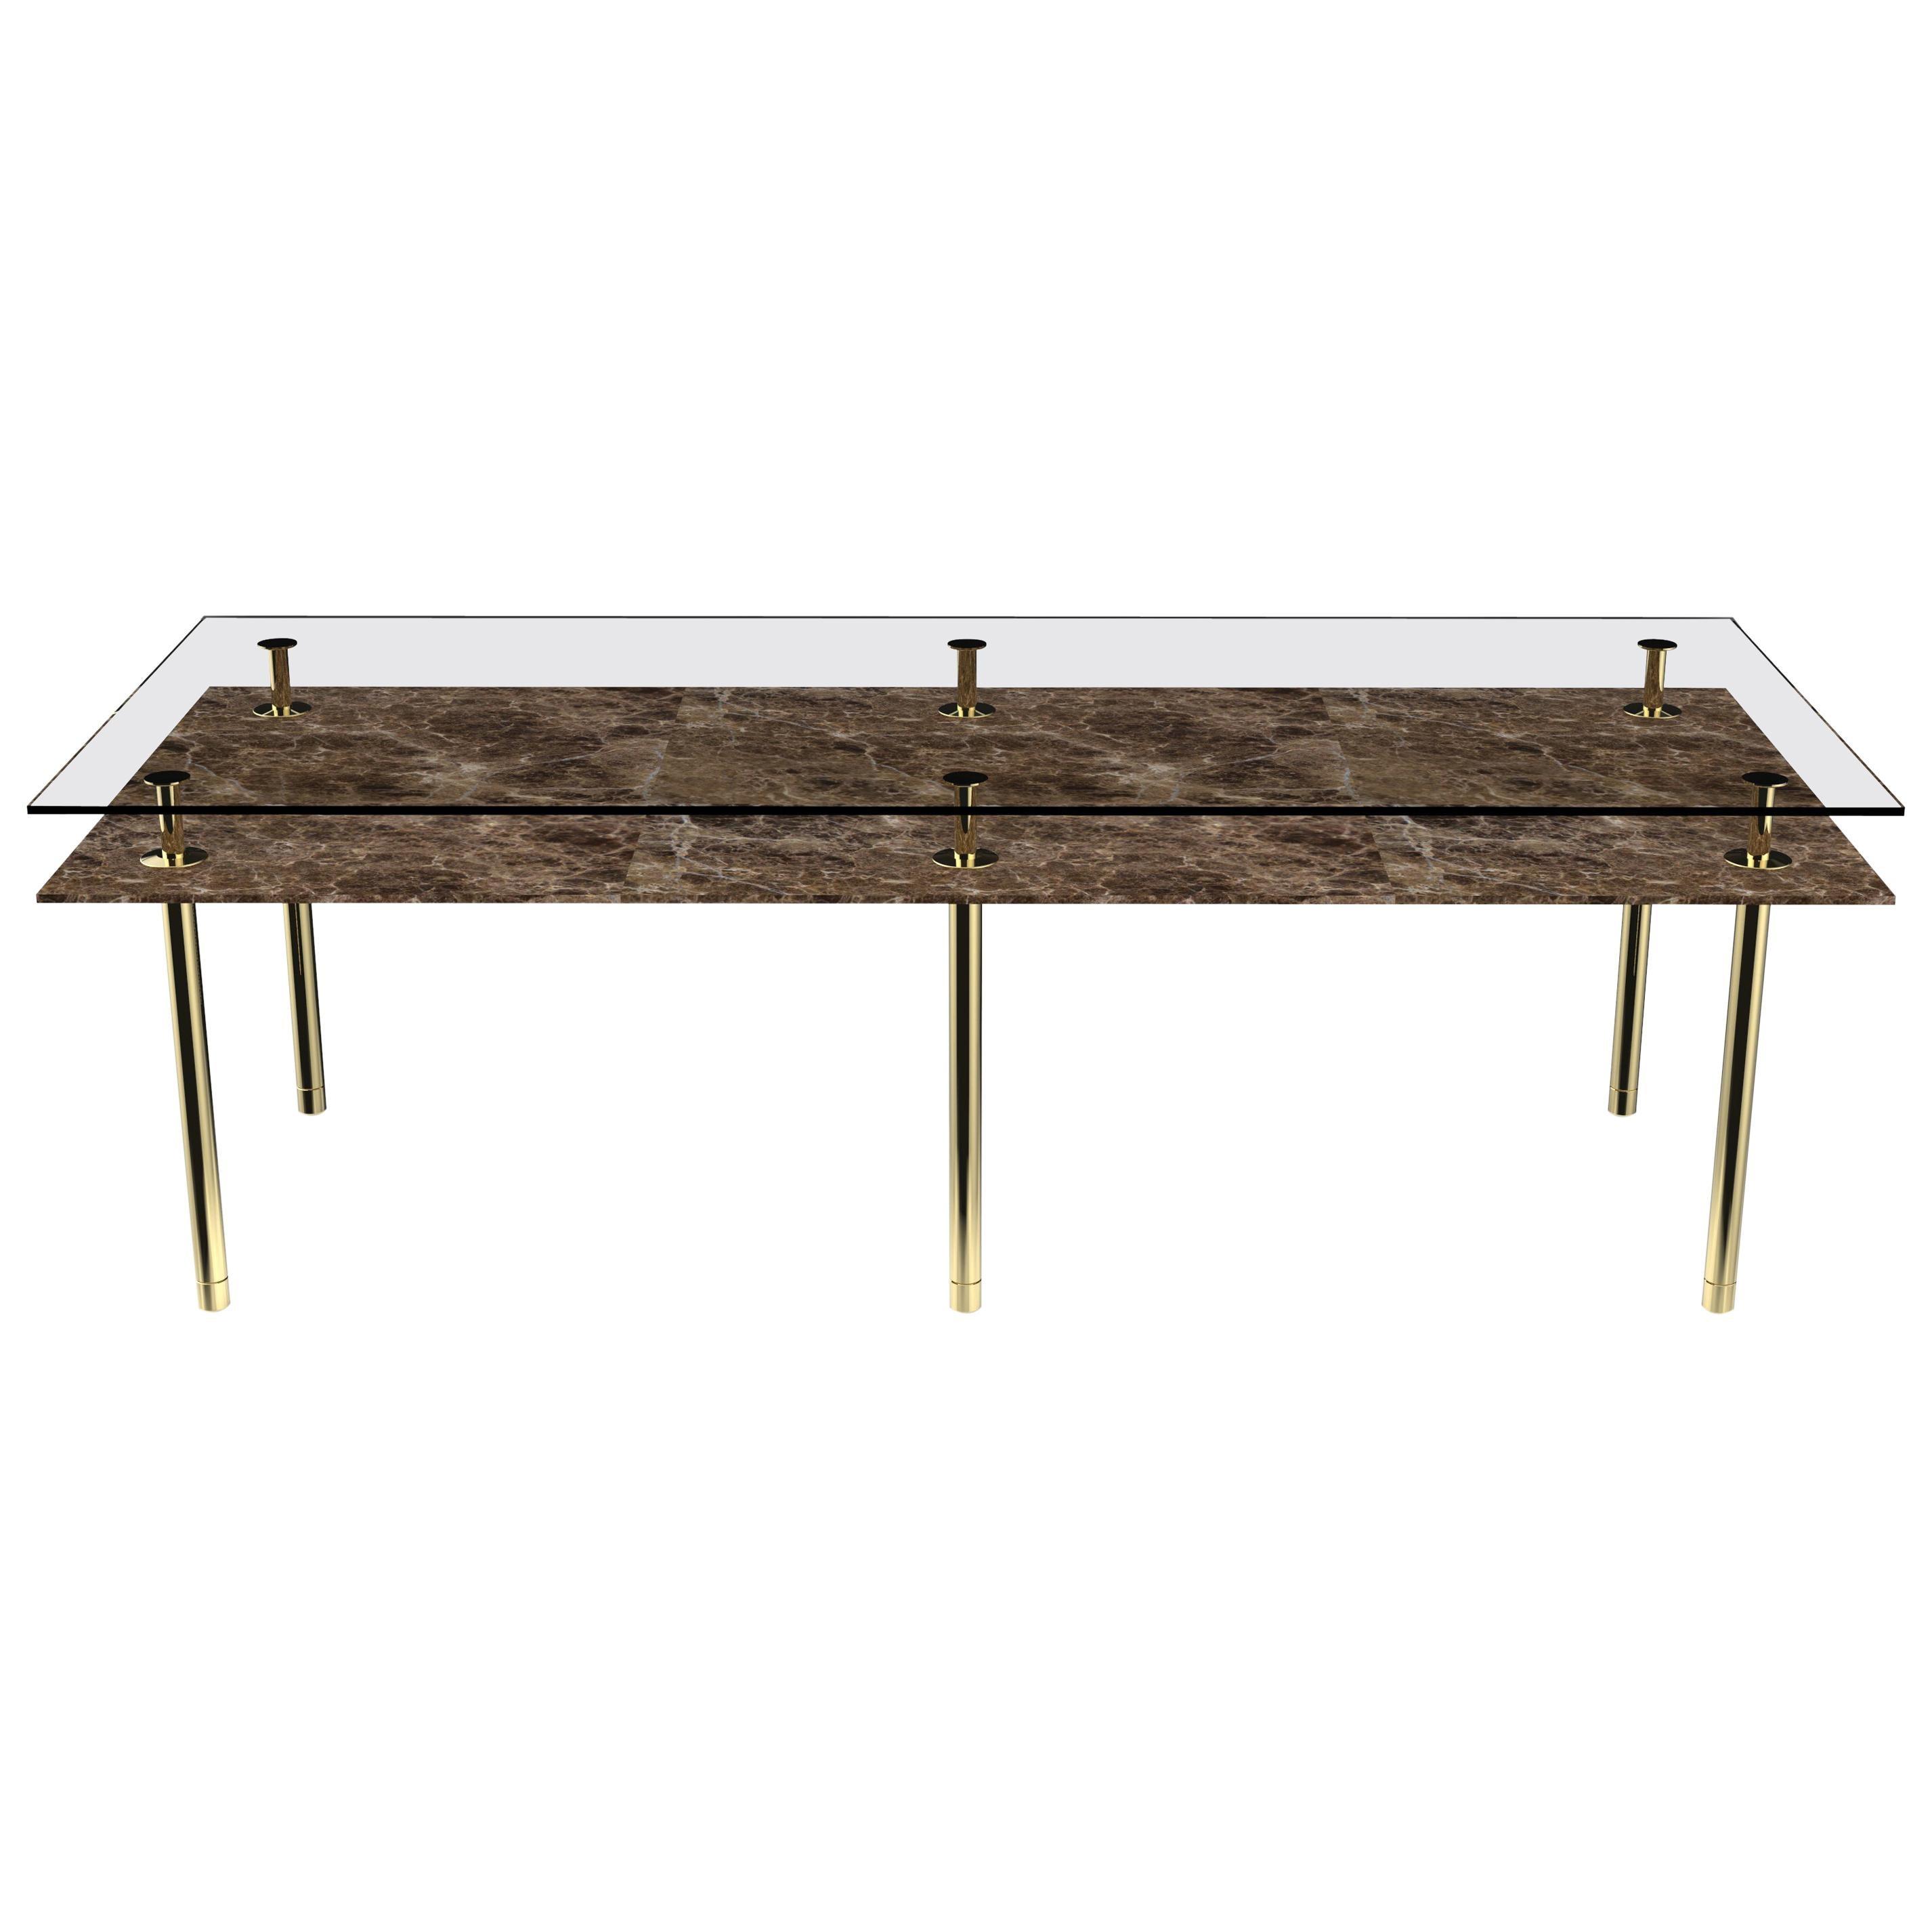 Ghidini 1961 Legs Rectangular Dining Table with Emperador Dark Marble Top